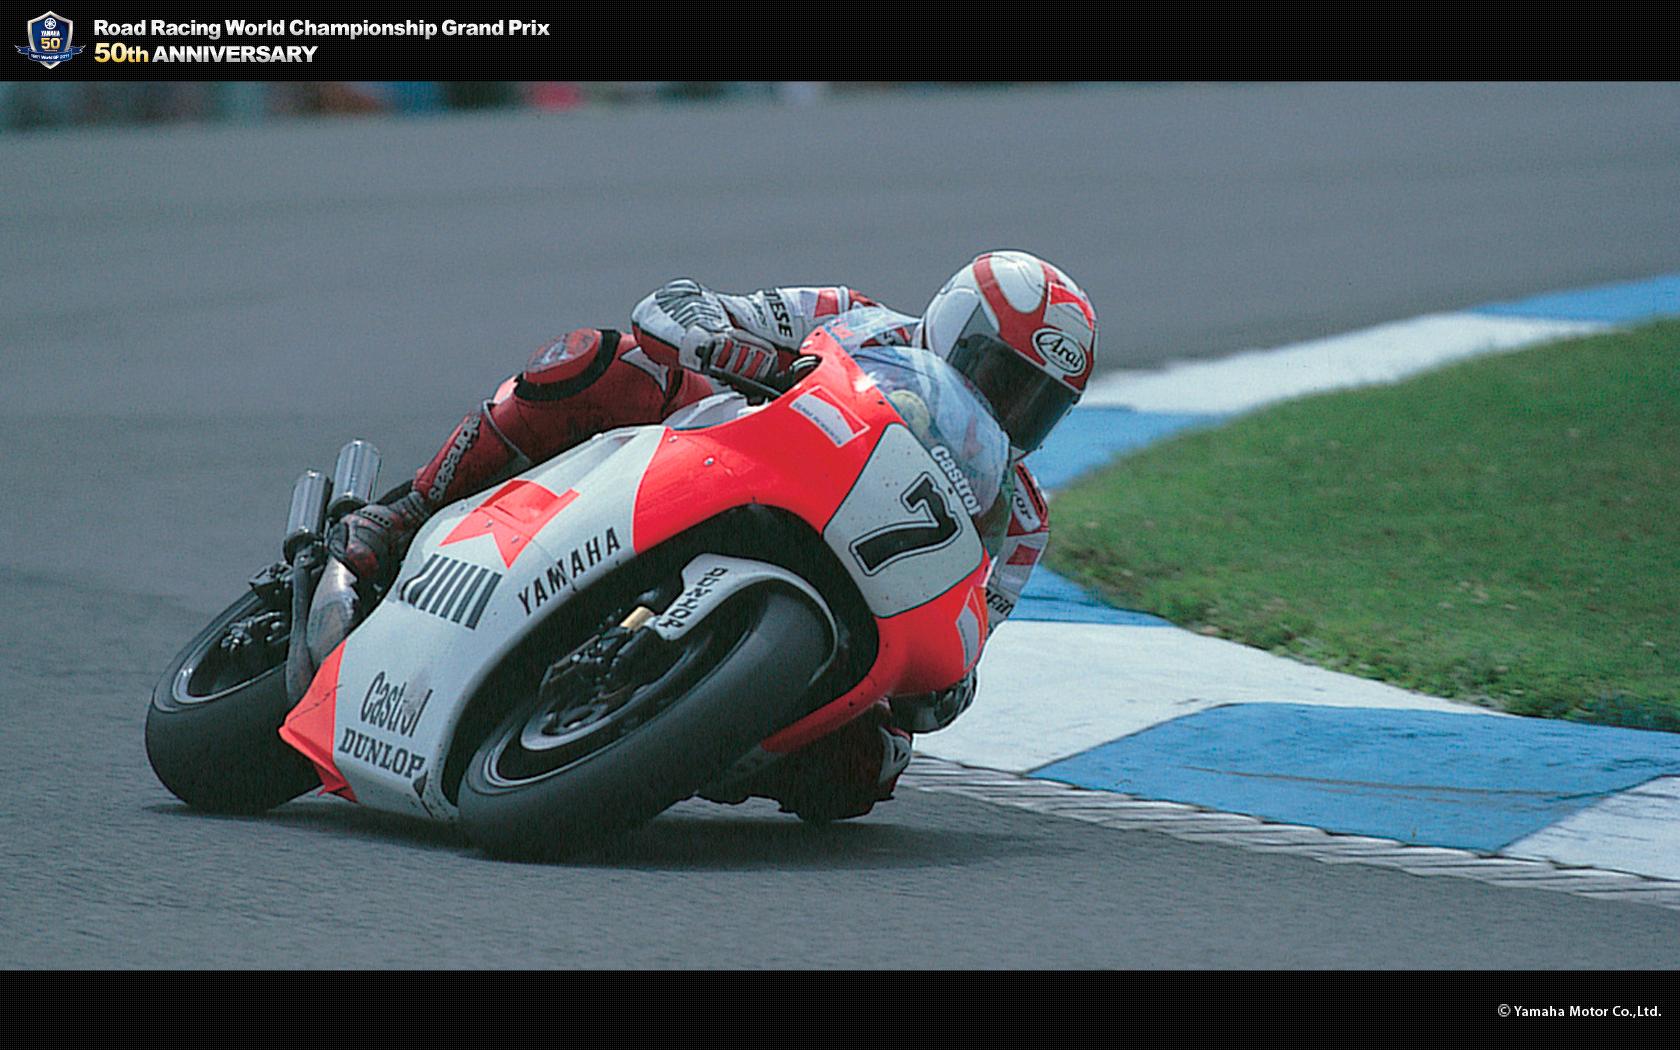 Luca Cadalora Race Yamaha Motor Co Ltd